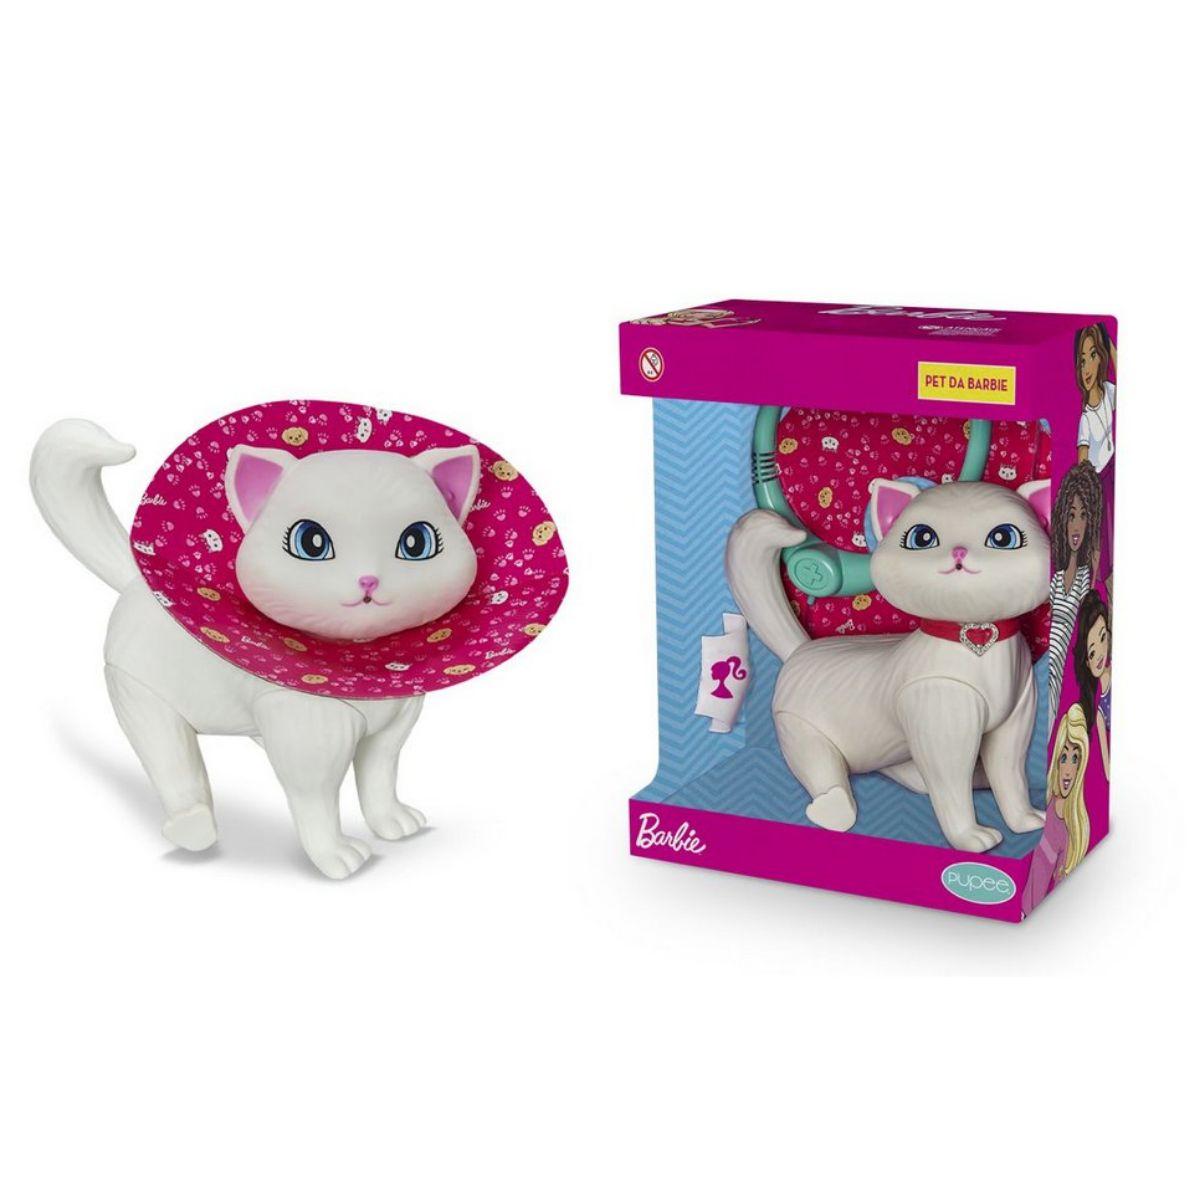 Blissa - Veterinária - Pets da Barbie - Mattel